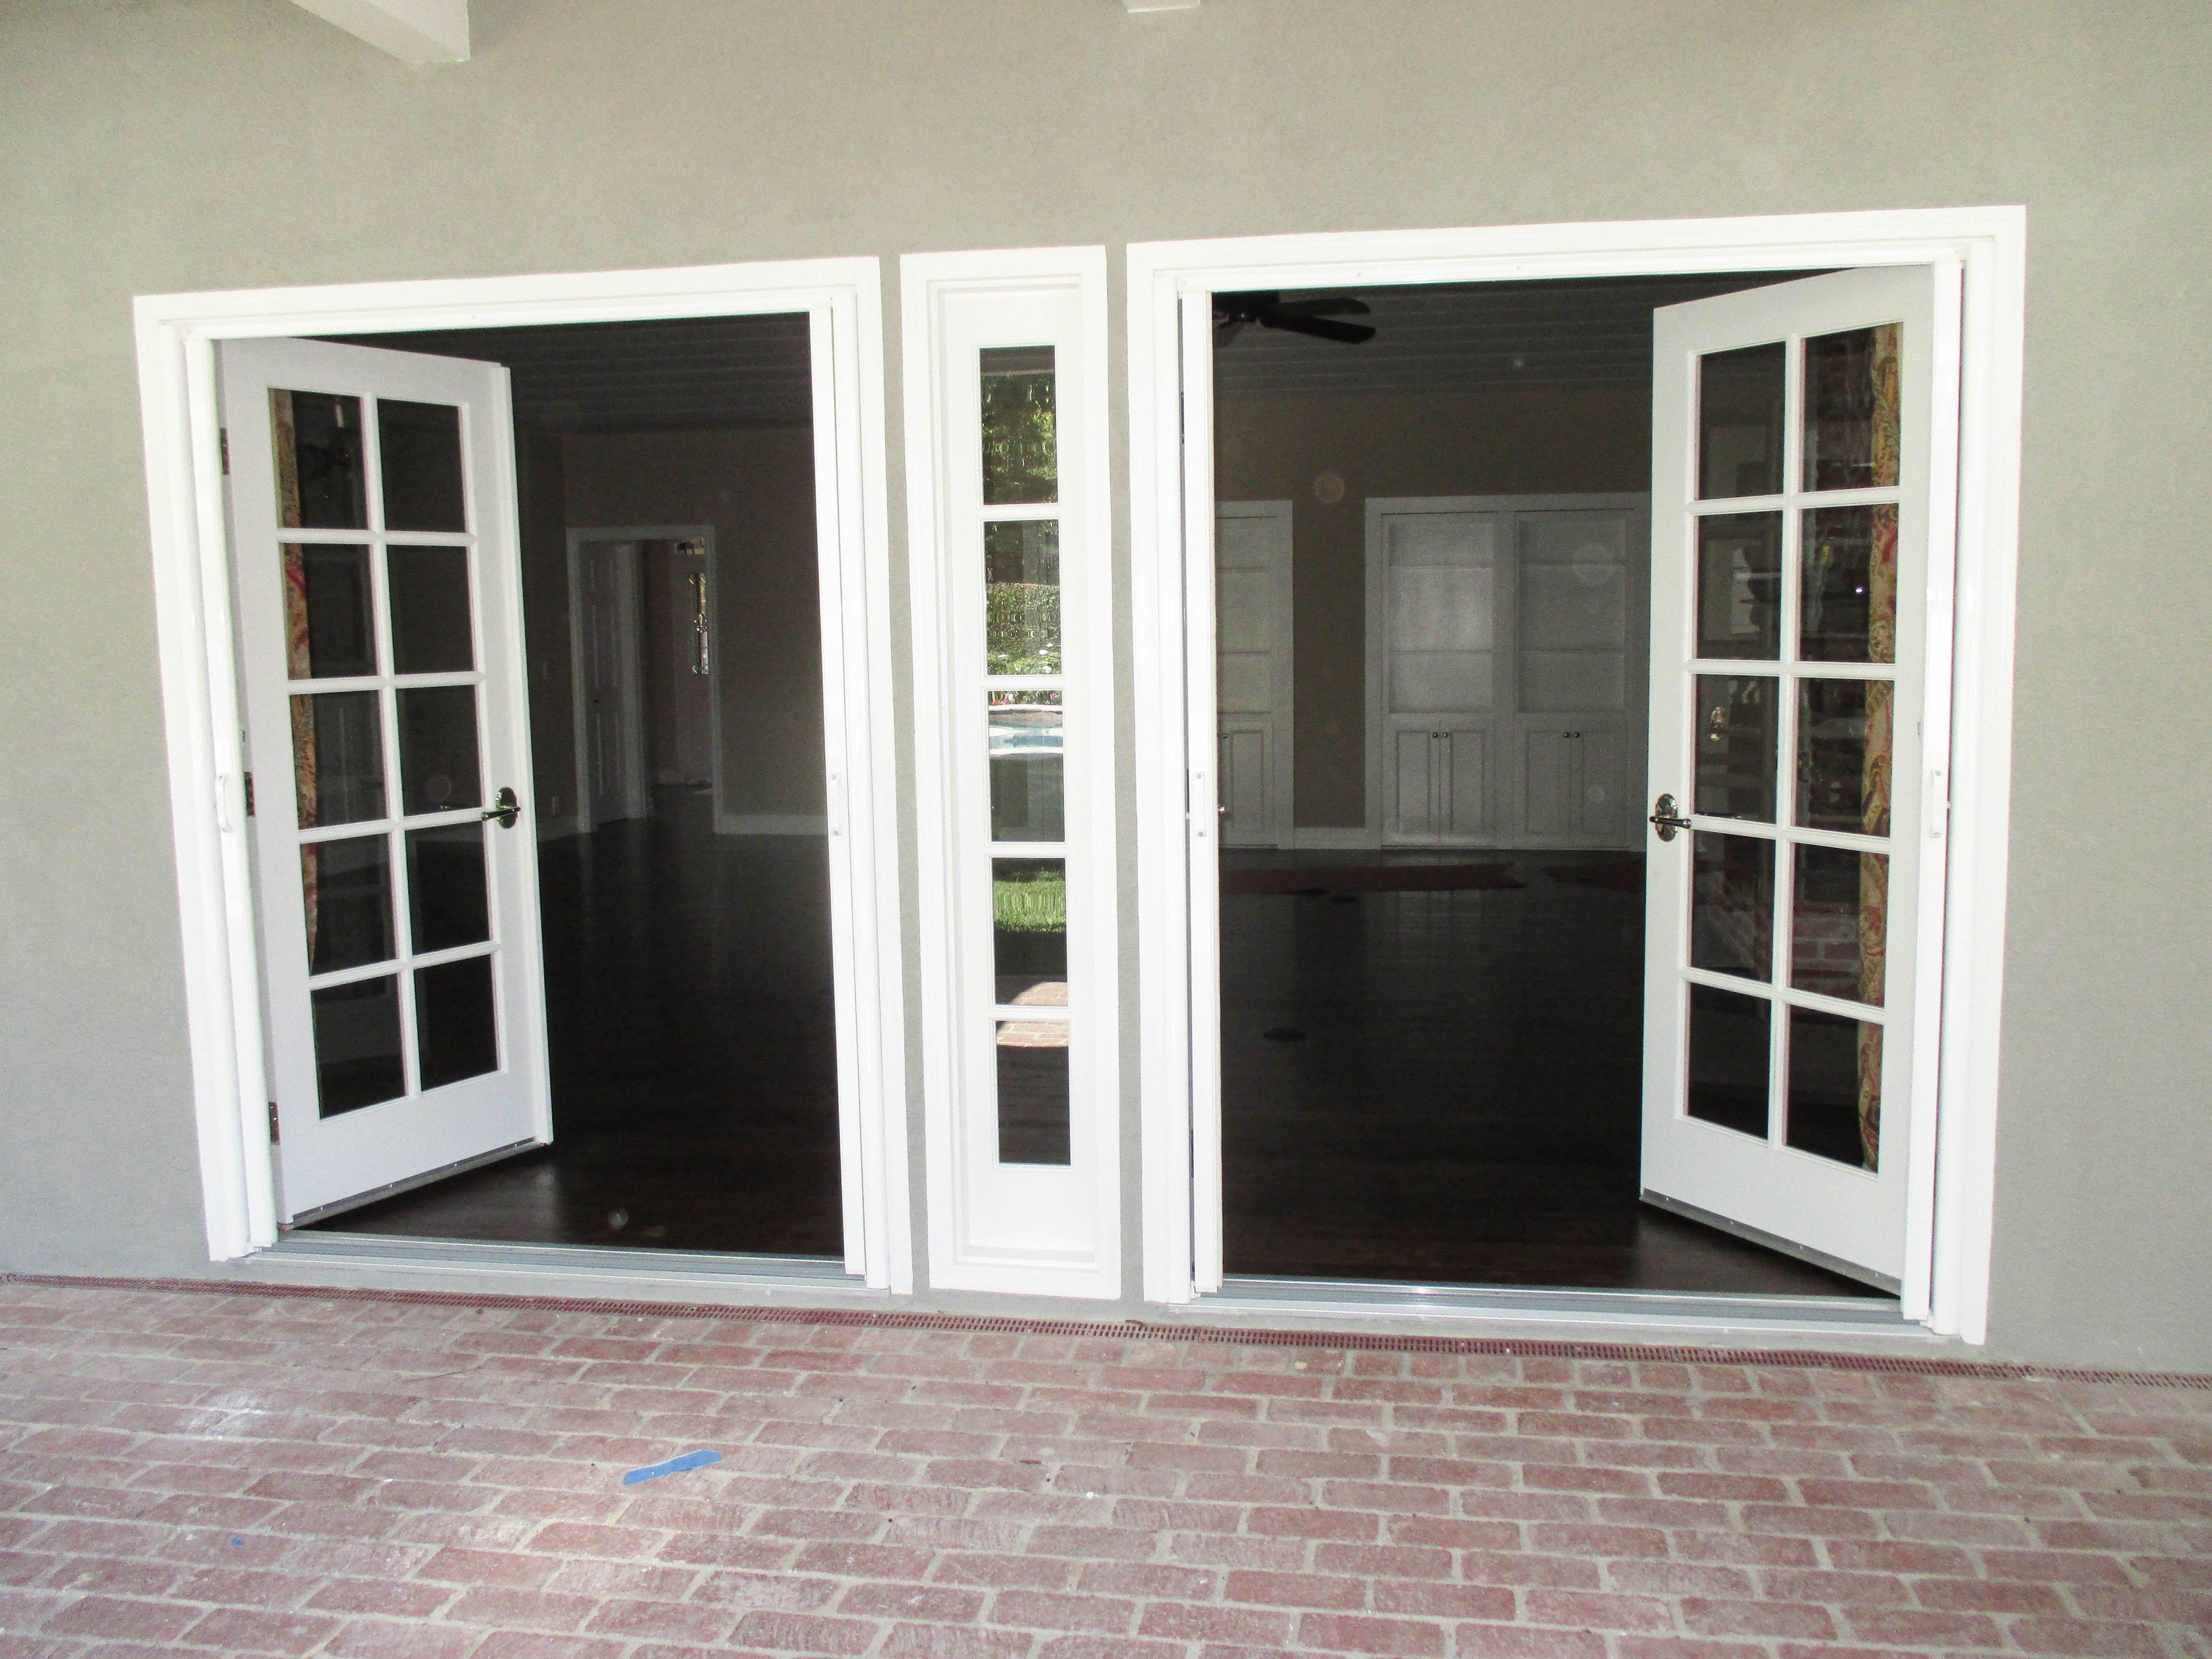 Check Out This Pair Of Double Door Inswing Bright White Stowaway Retractable Screen Doors That Our Team Retractable Screen Door Retractable Screen Screen Door